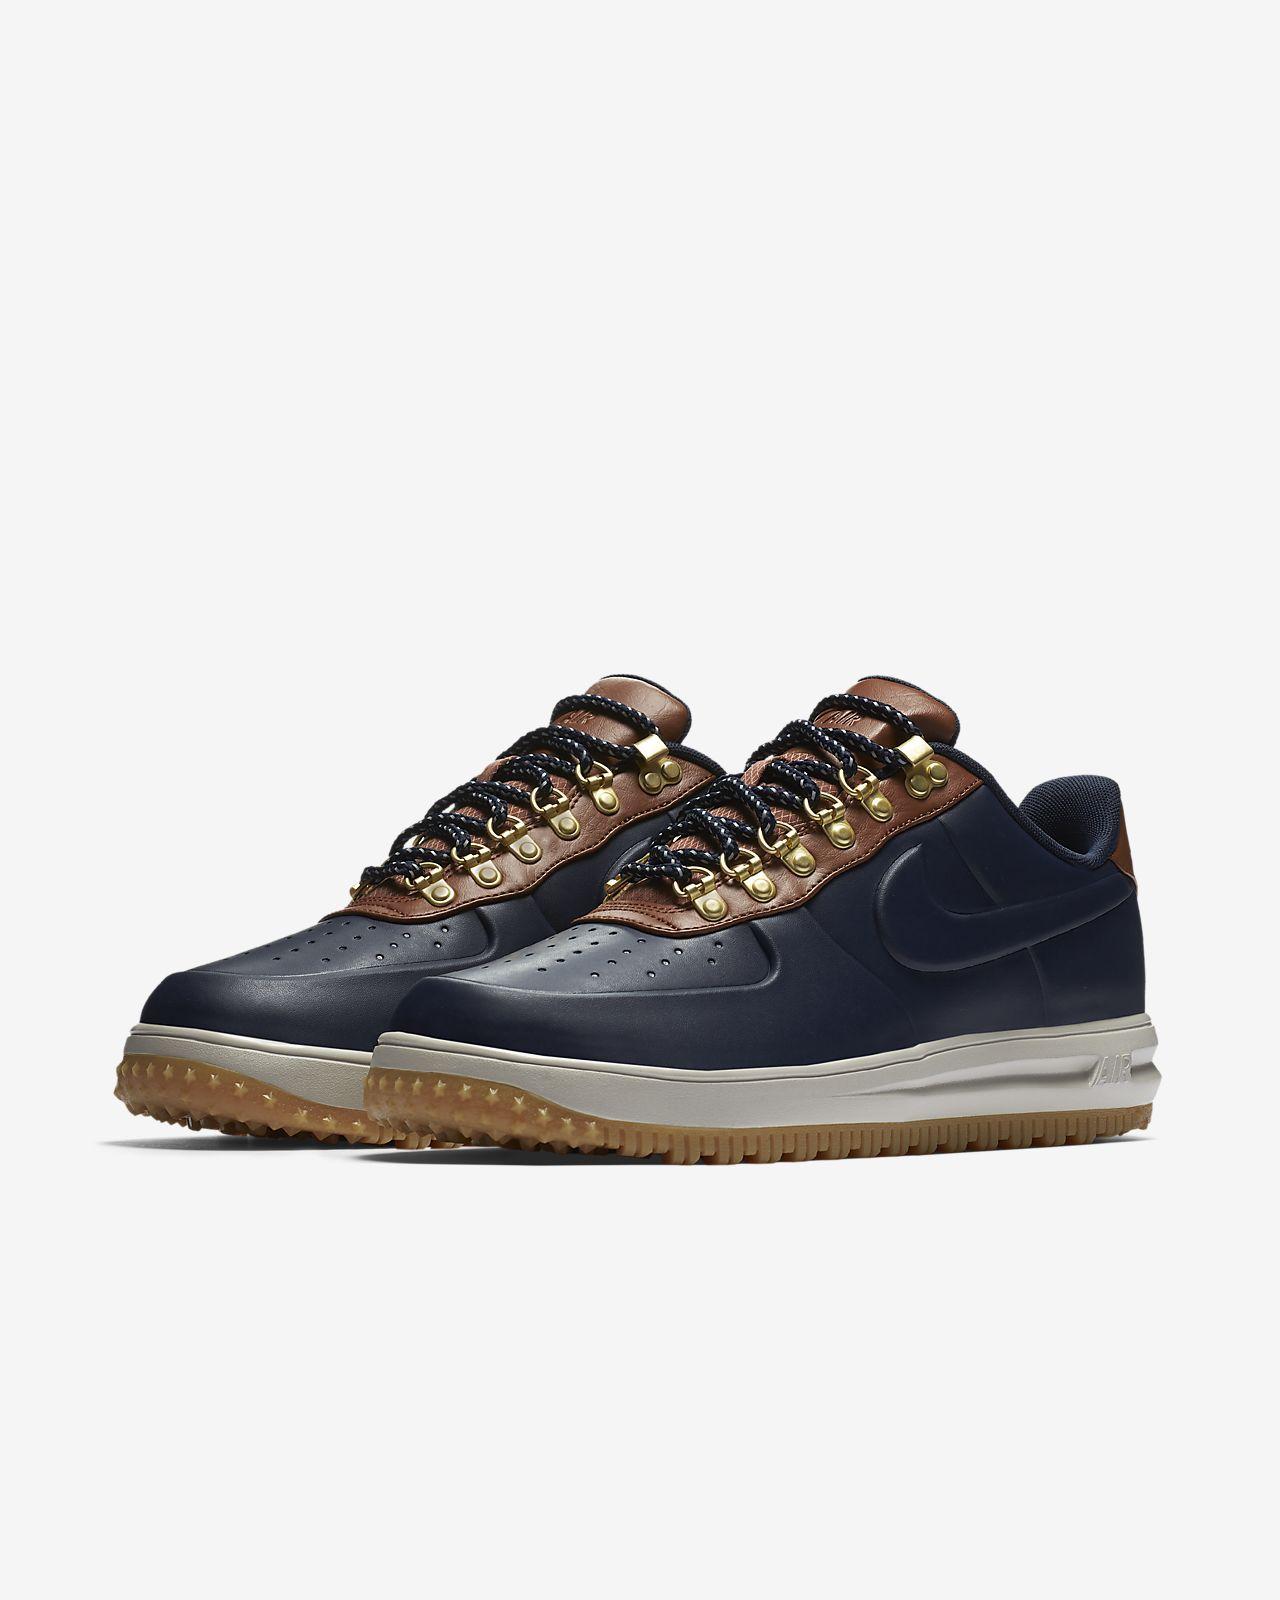 Duck boots, Shoes mens, Nike lunar force